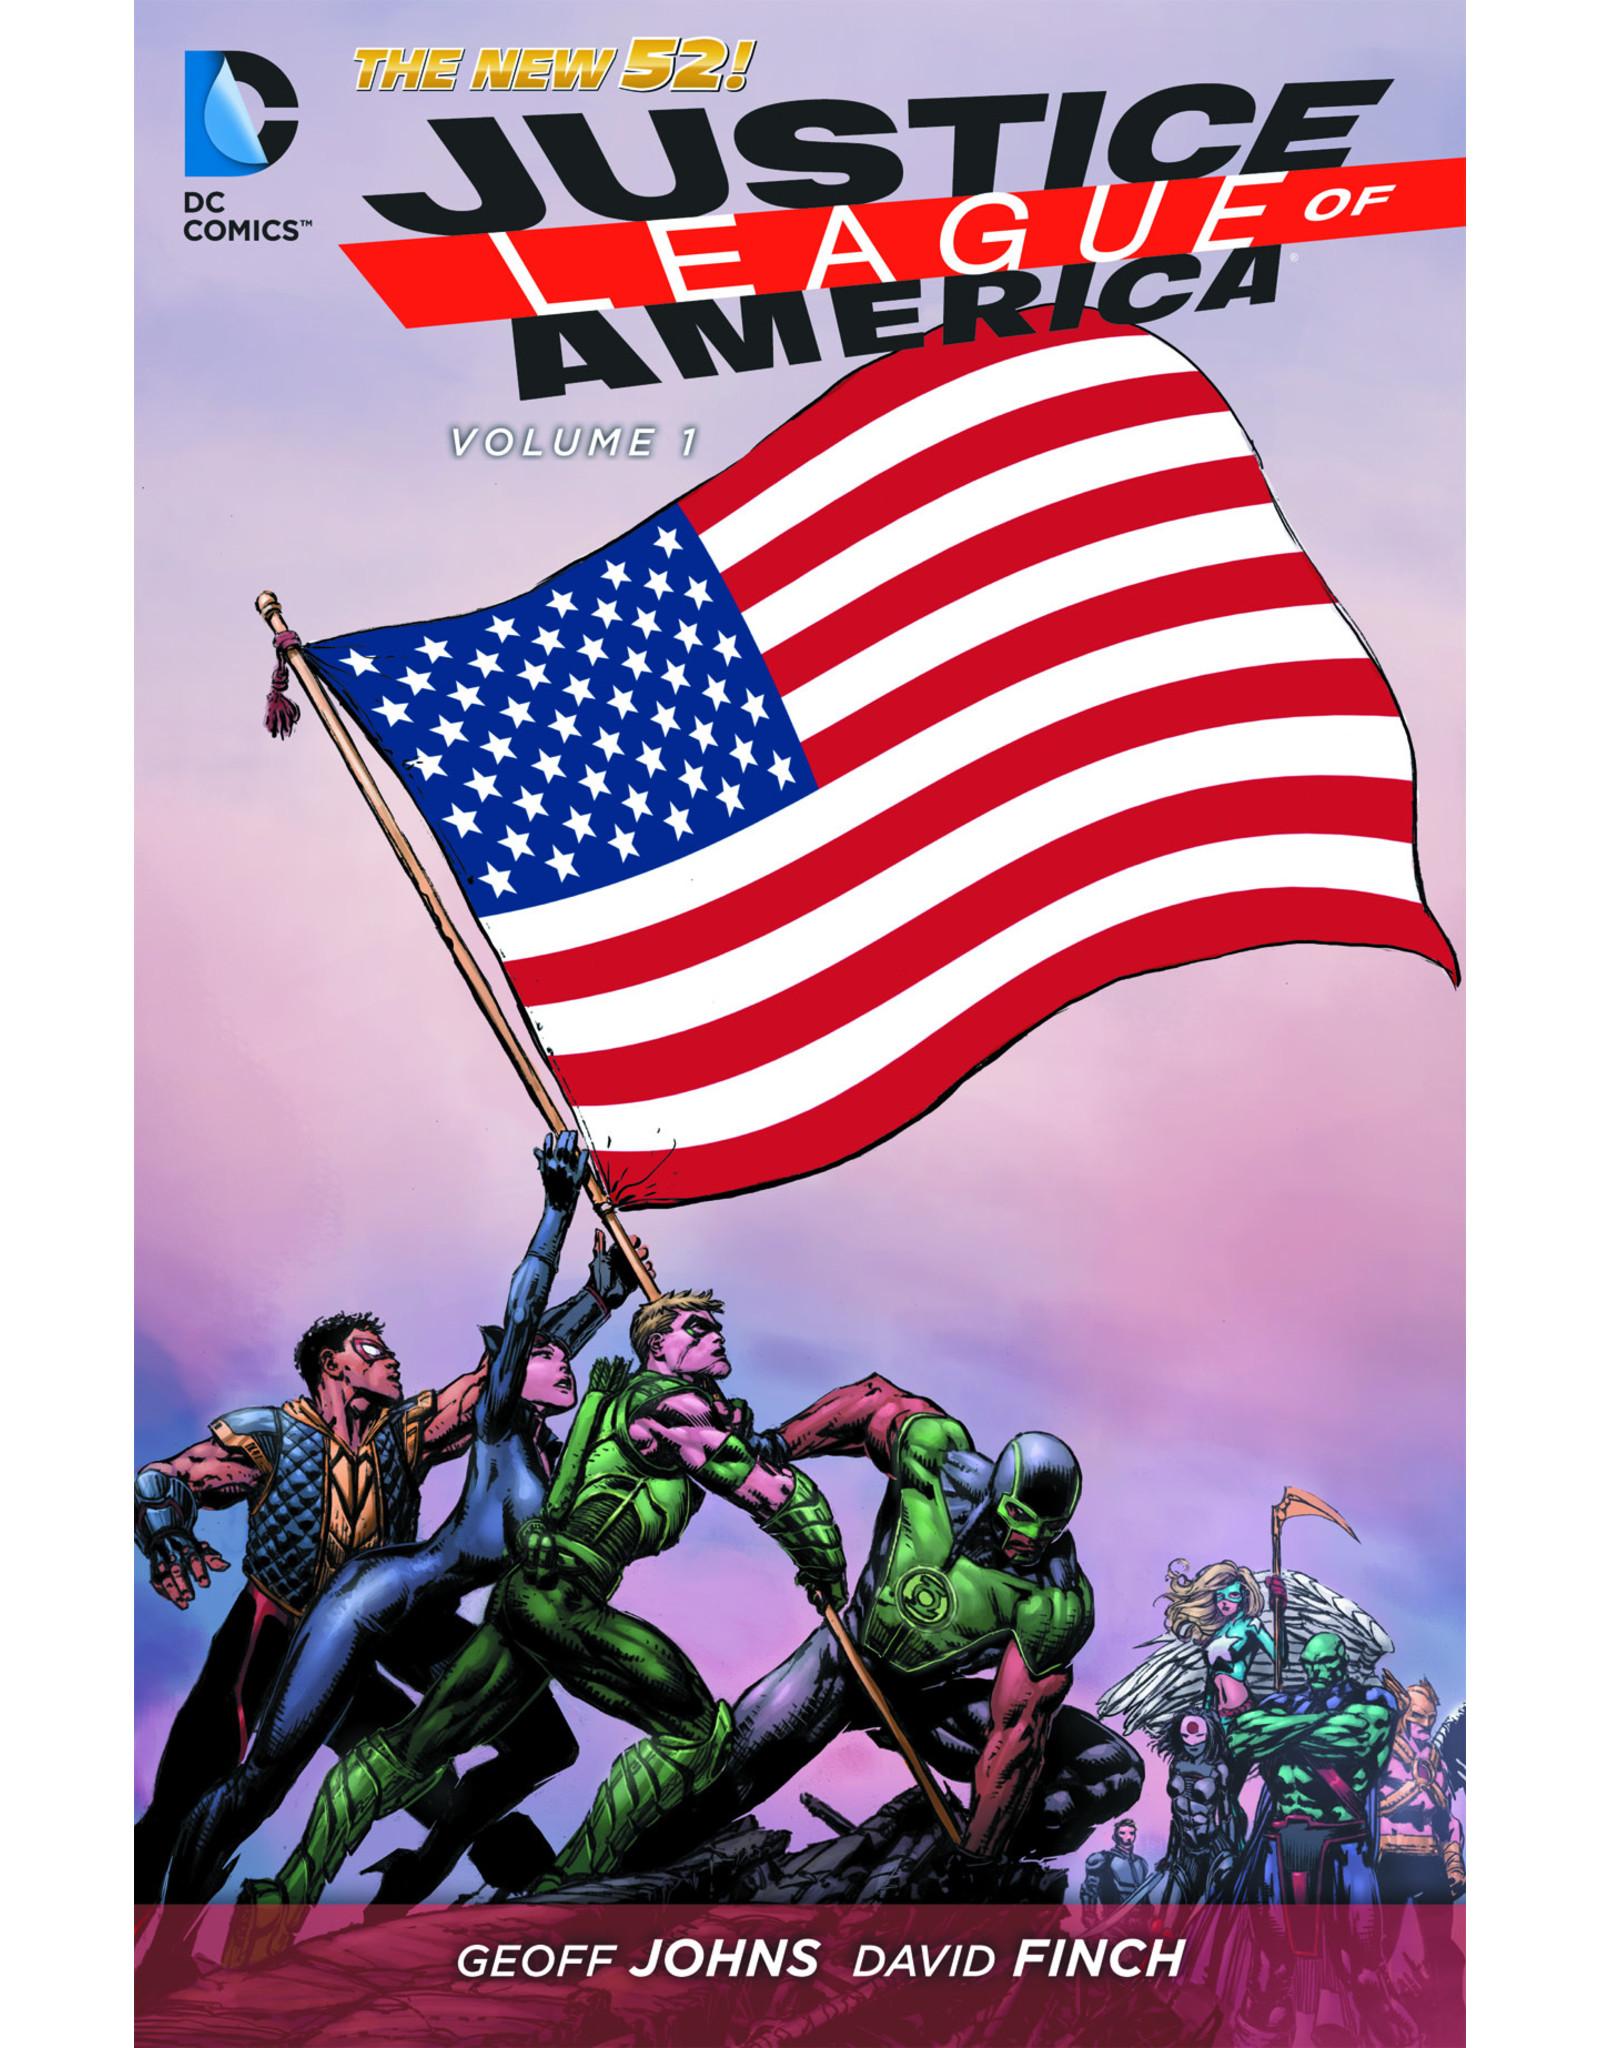 DC COMICS JUSTICE LEAGUE OF AMERICA HC VOL 01